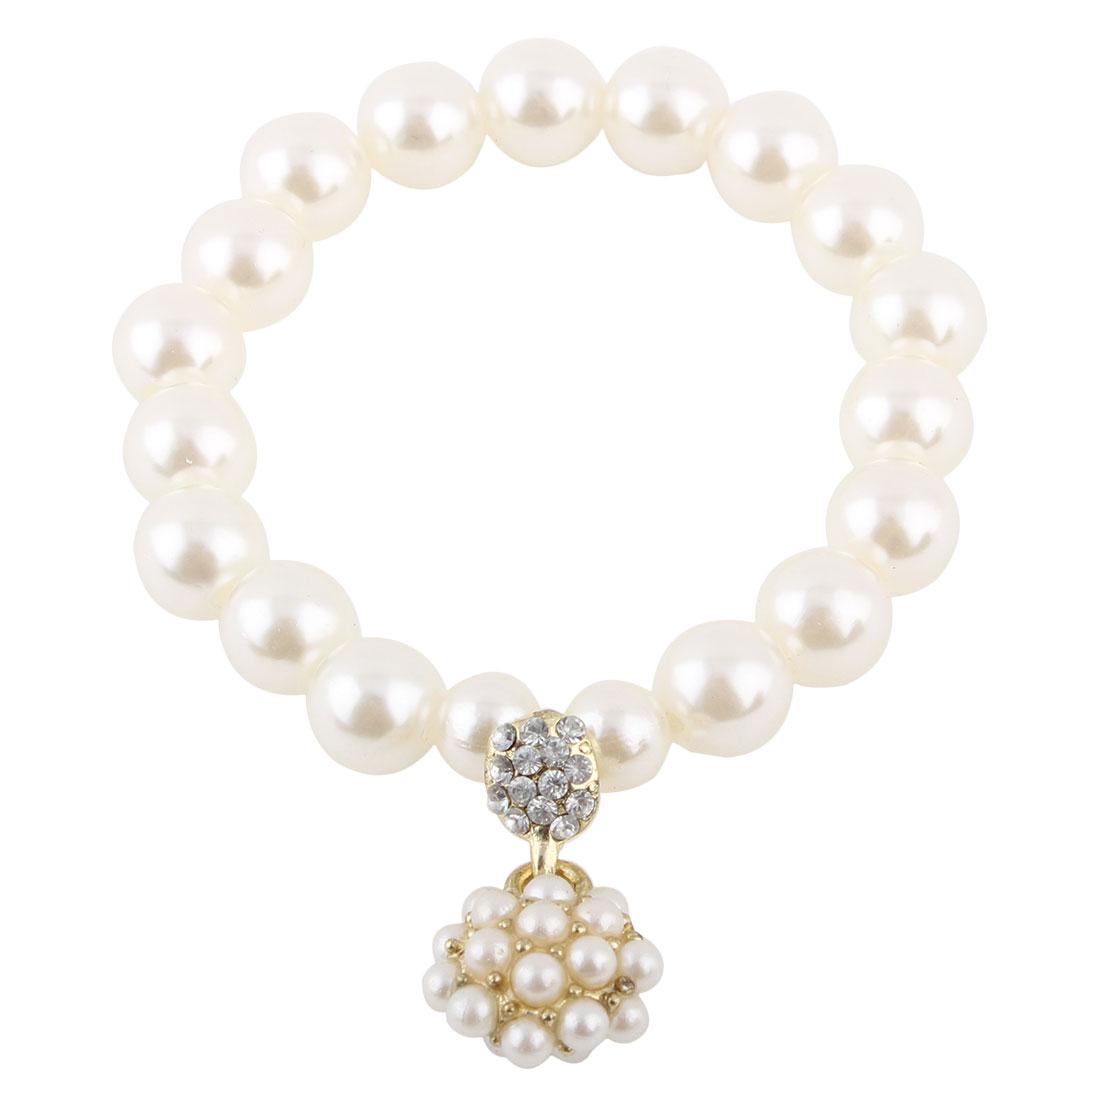 Women Jewelry Faux Imitation Pearls Beads Decor Elastic Wrist Bangle Bracelet White